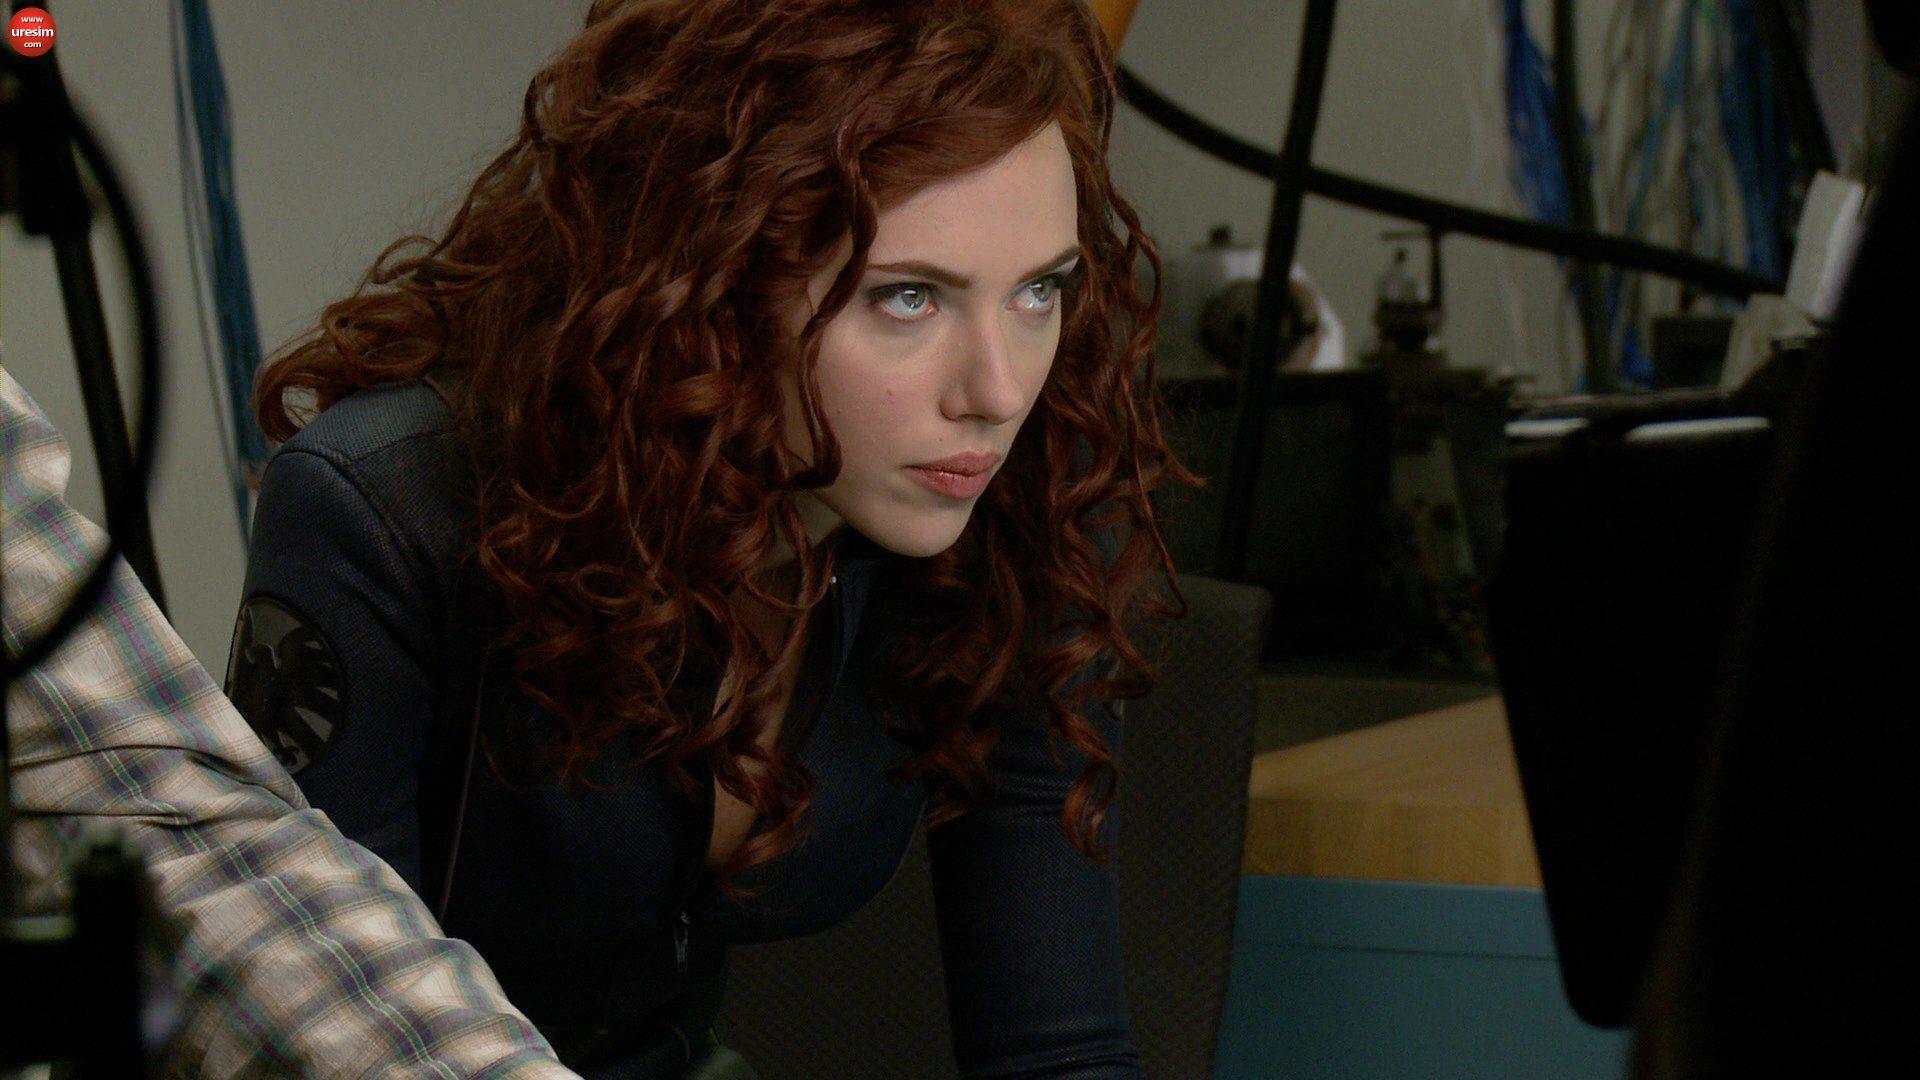 Scarlett Johansson Wallpapers Top Free Scarlett Johansson